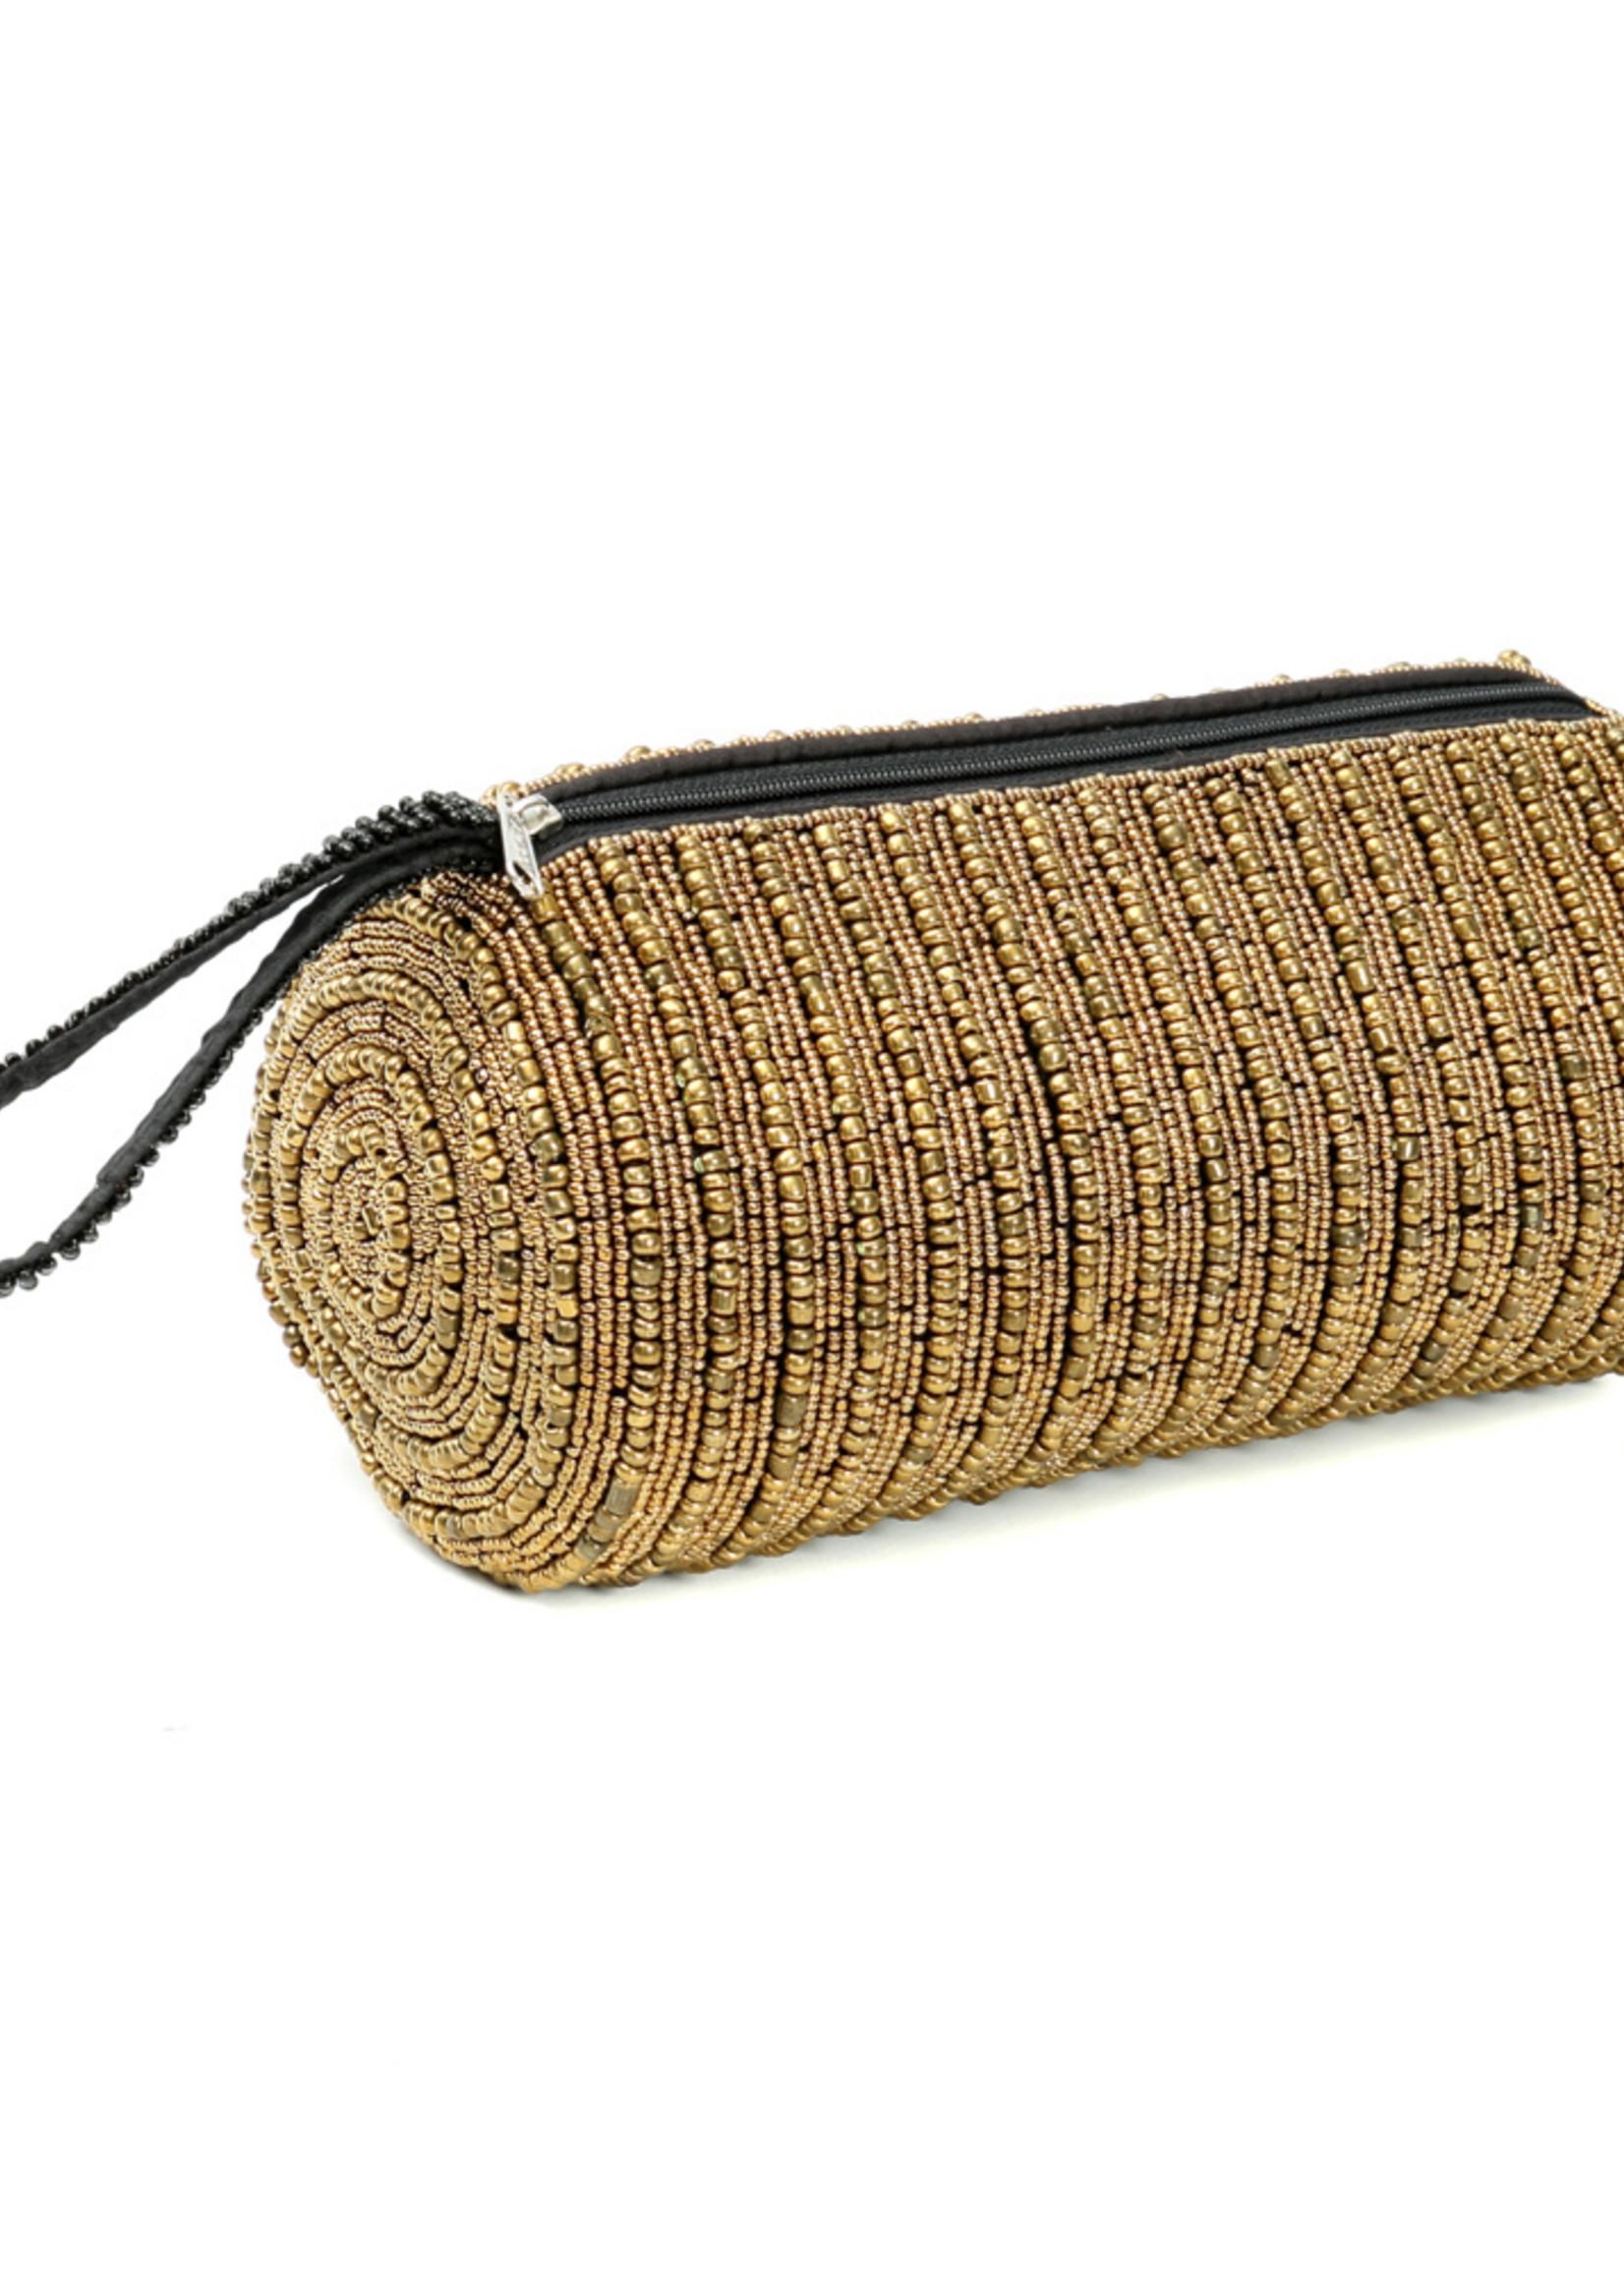 The Pencil Case - Gold